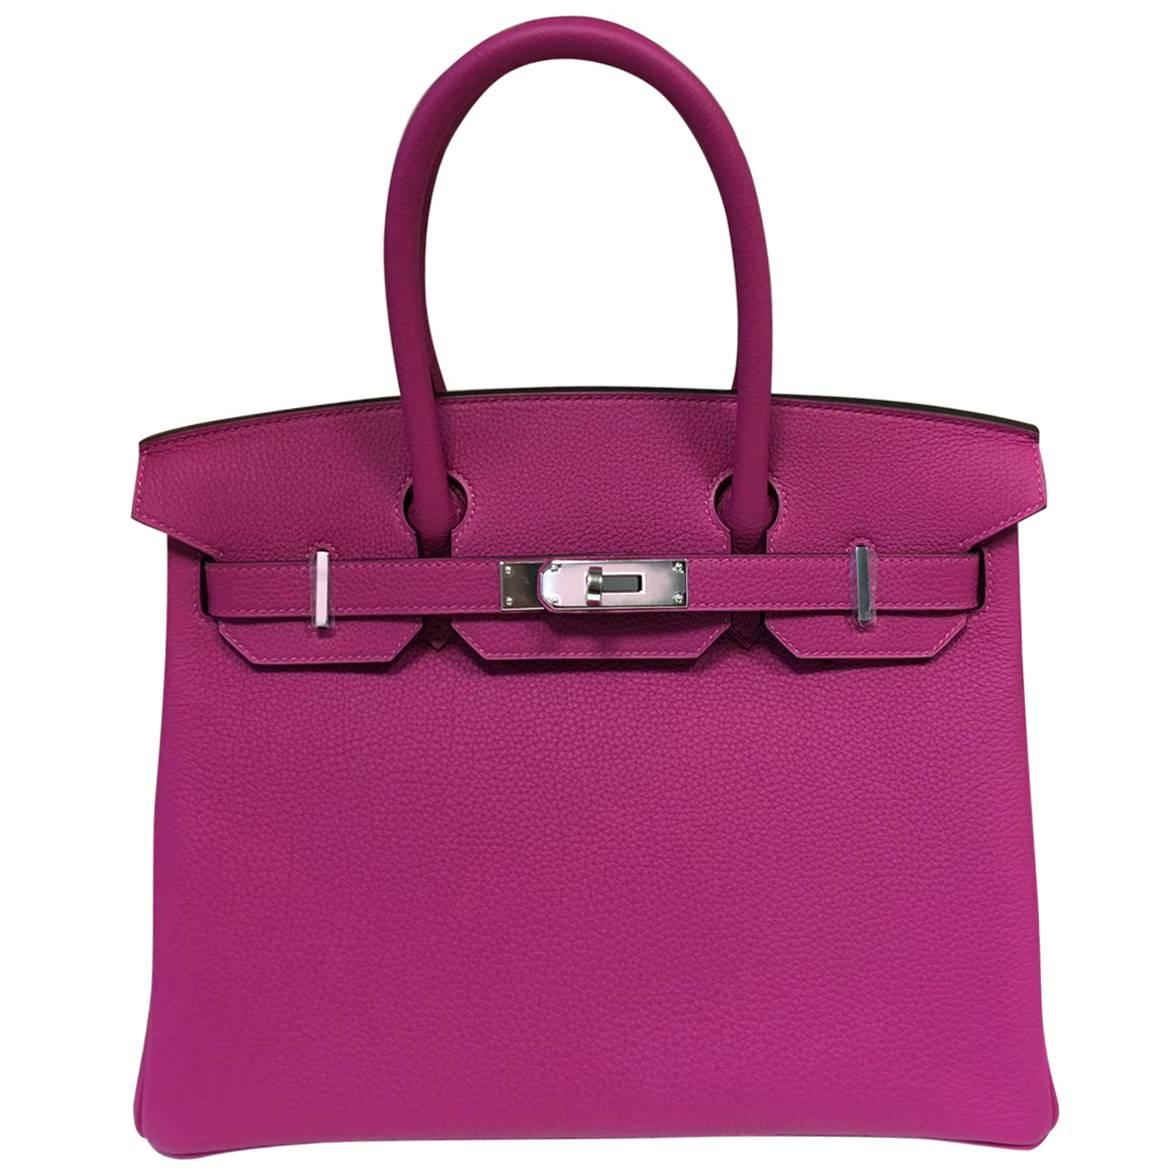 01bfe2523c591 ... promo code for hermes birkin bag rose pourpre 30 togo palladium  hardware for sale 5168f cbb48